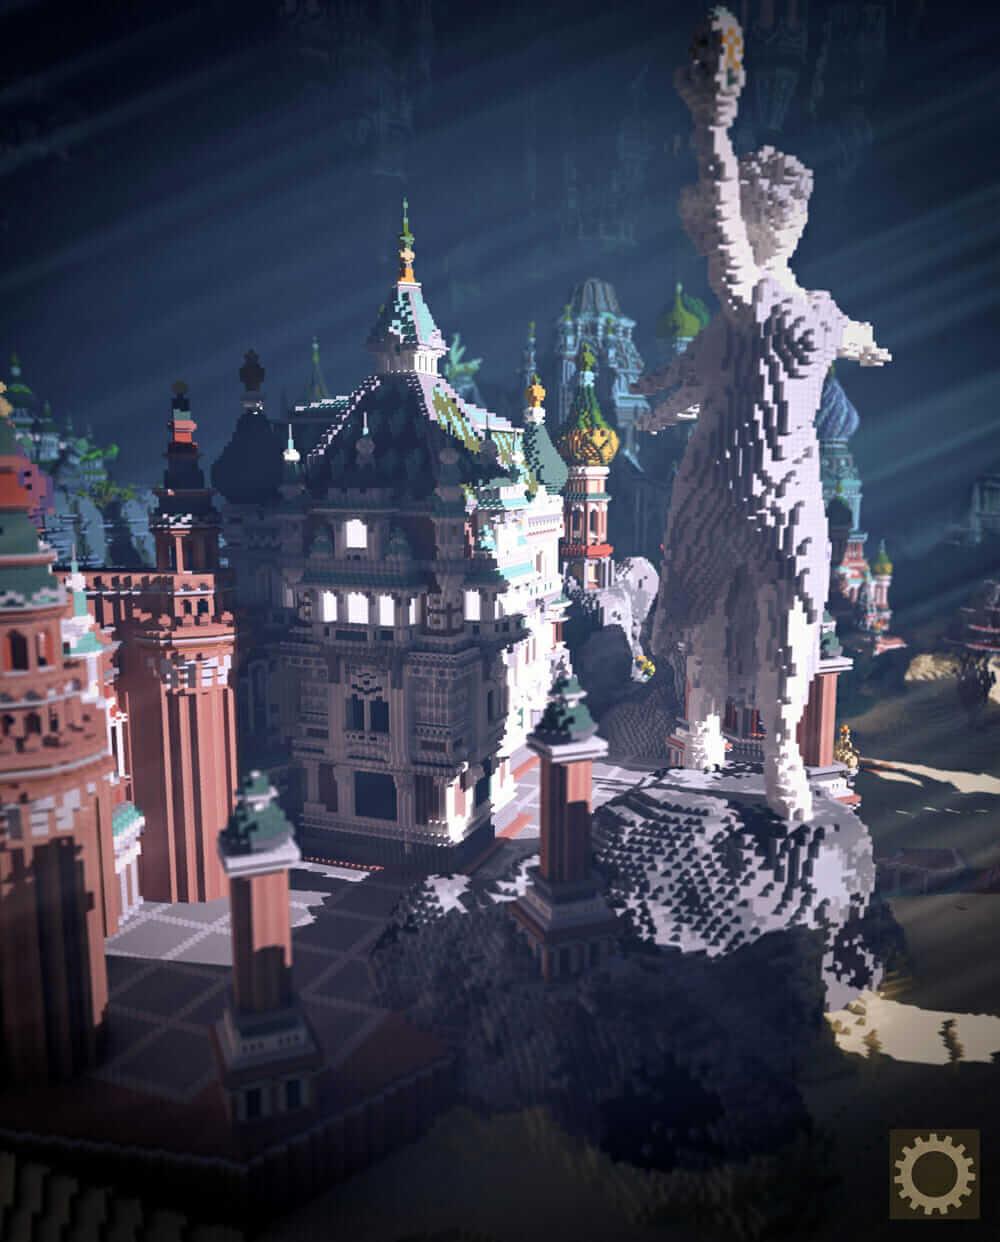 minecraft_architecture_faberge